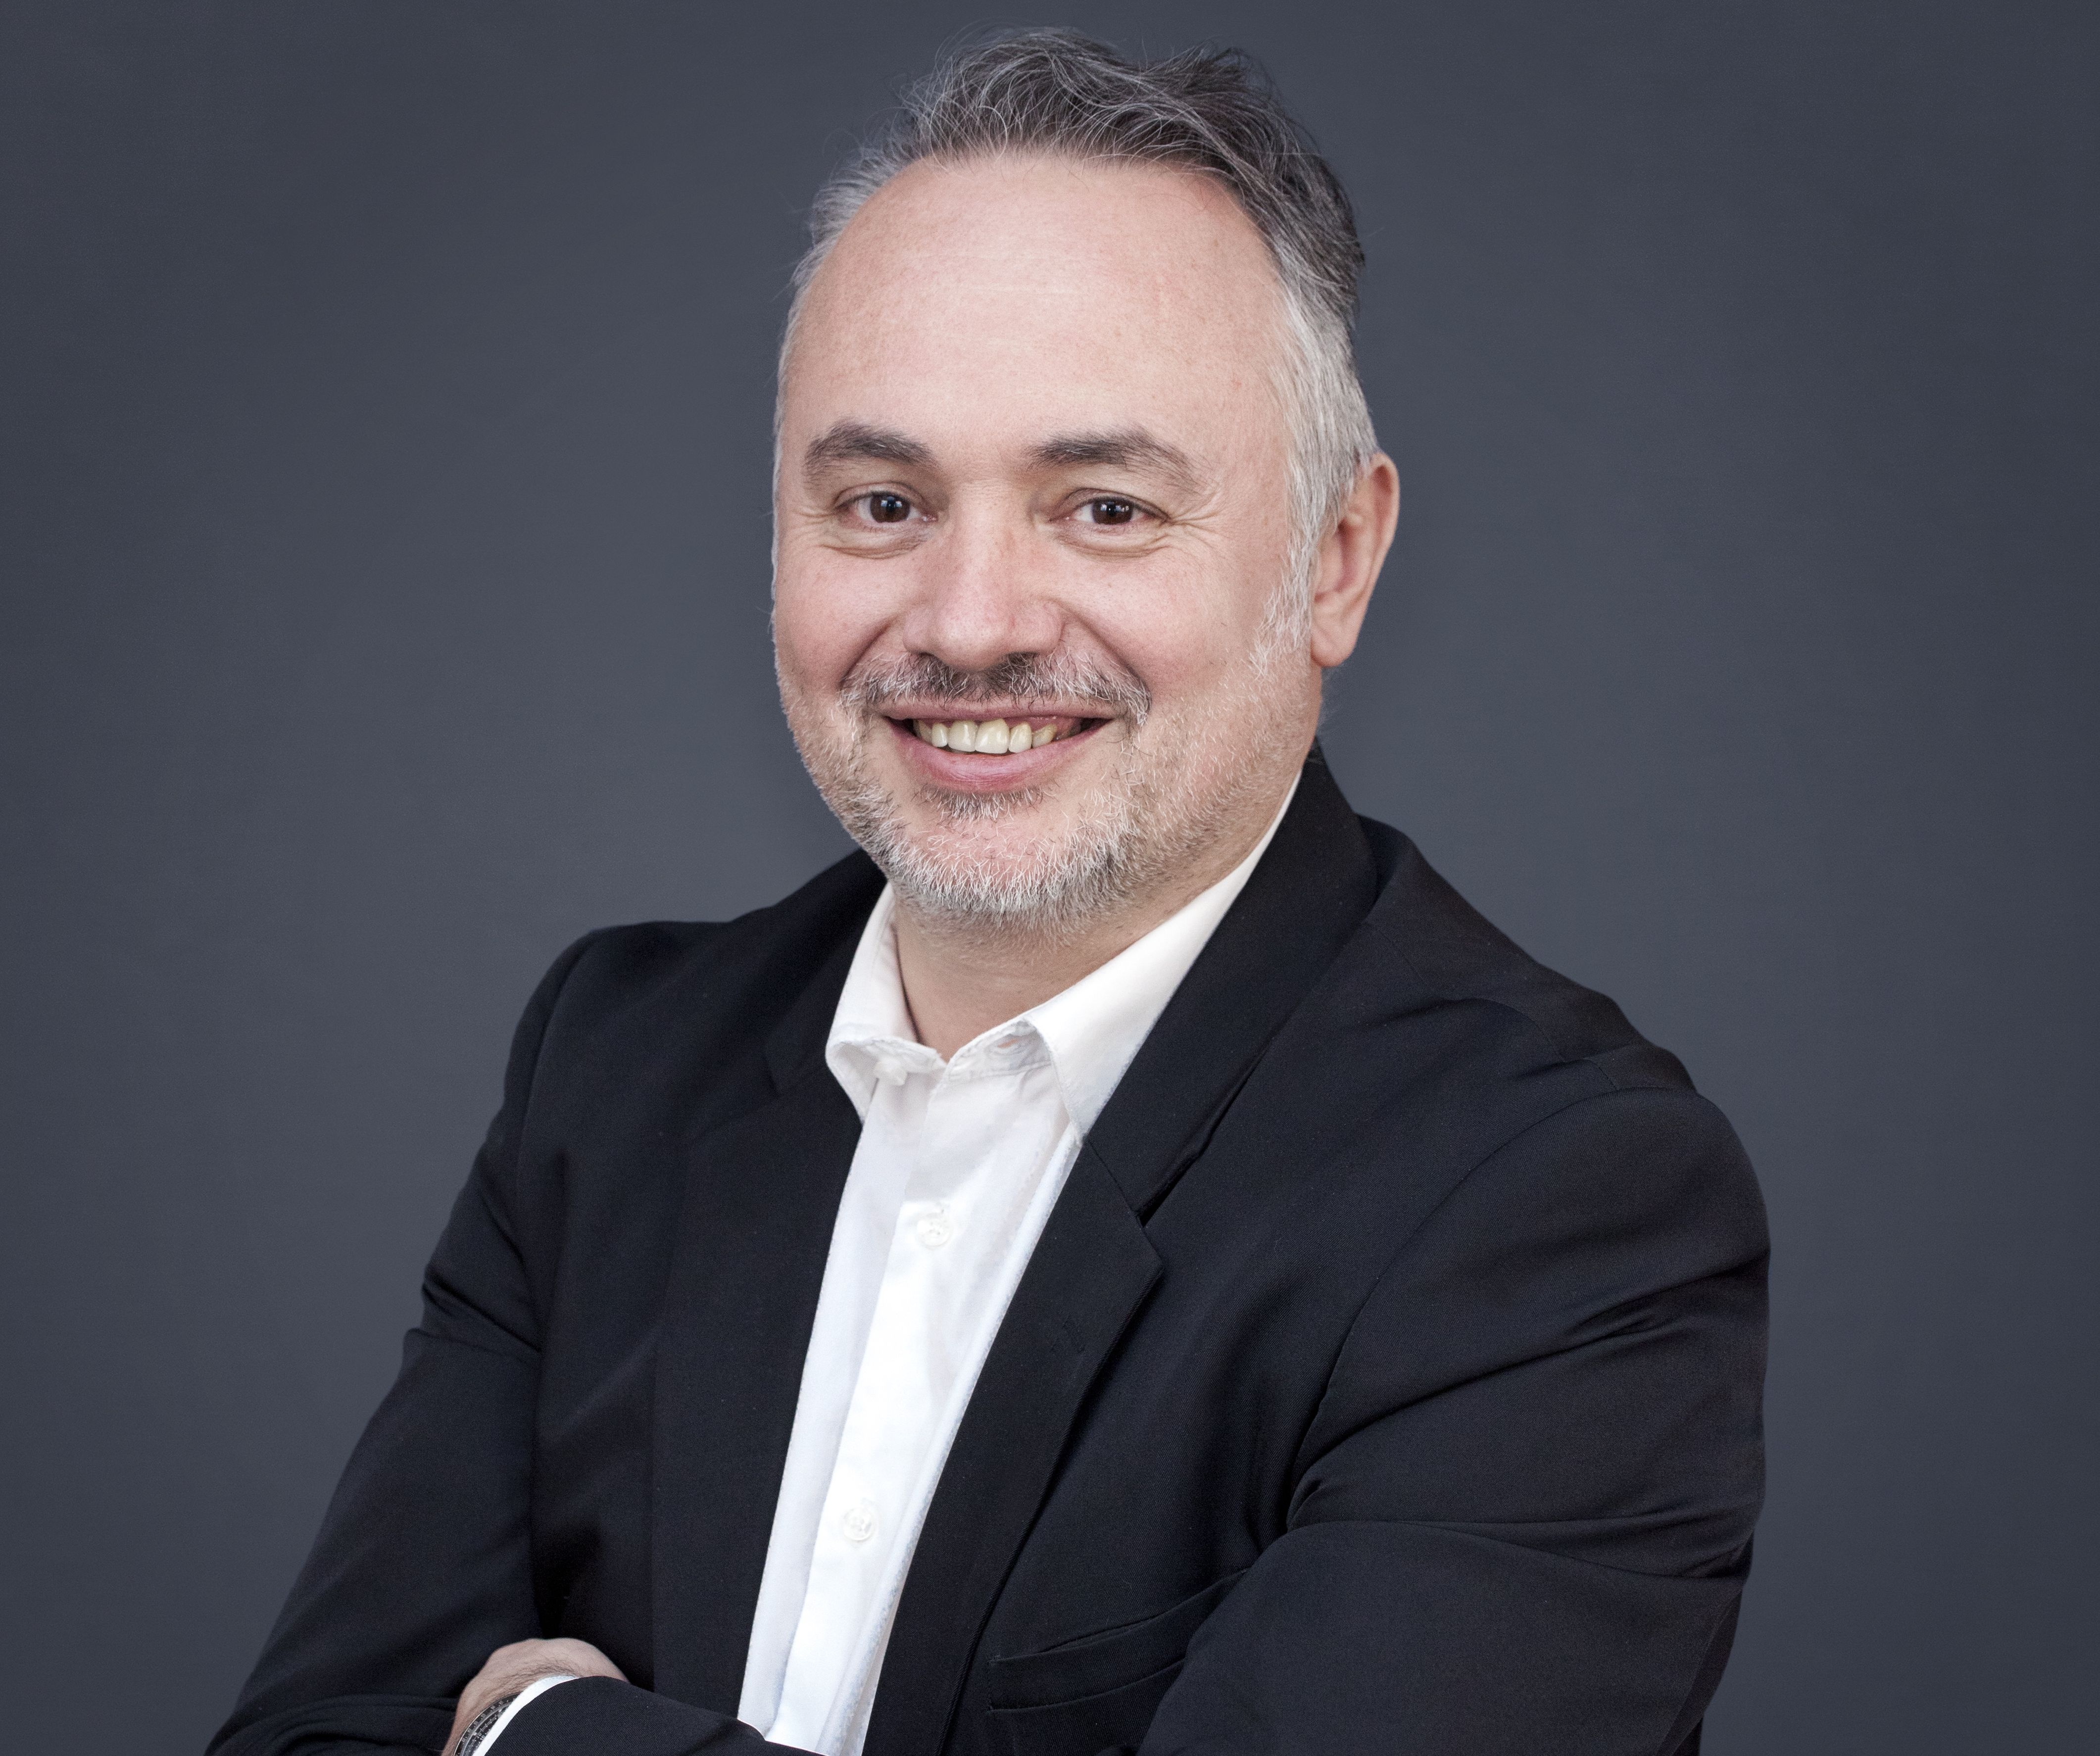 David Chassan